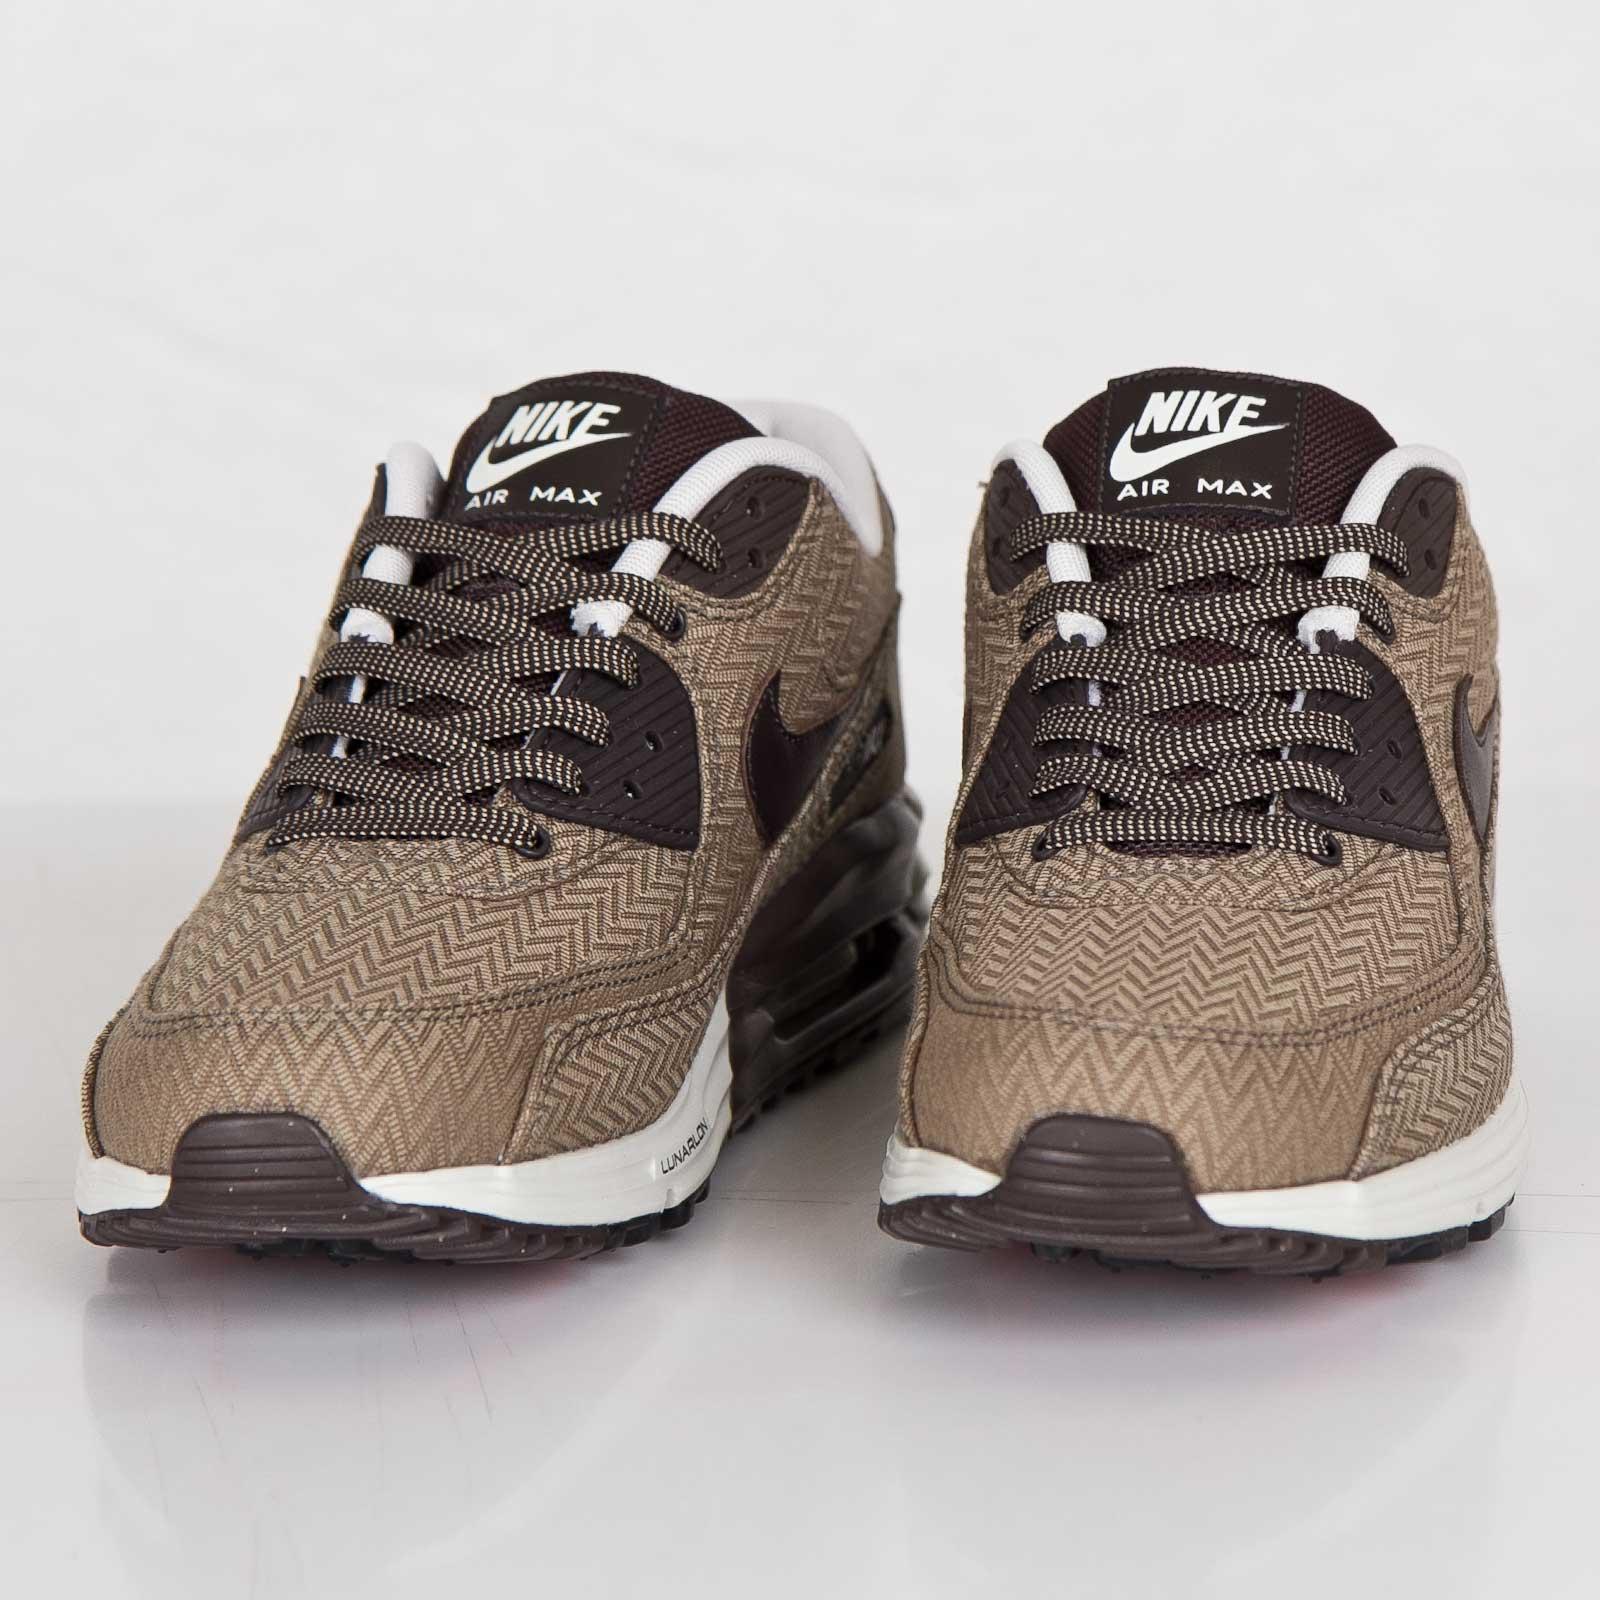 quality design 2712c 6d730 Nike Air Max Lunar90 Premium QS - 705068-200 - Sneakersnstuff   sneakers    streetwear online since 1999